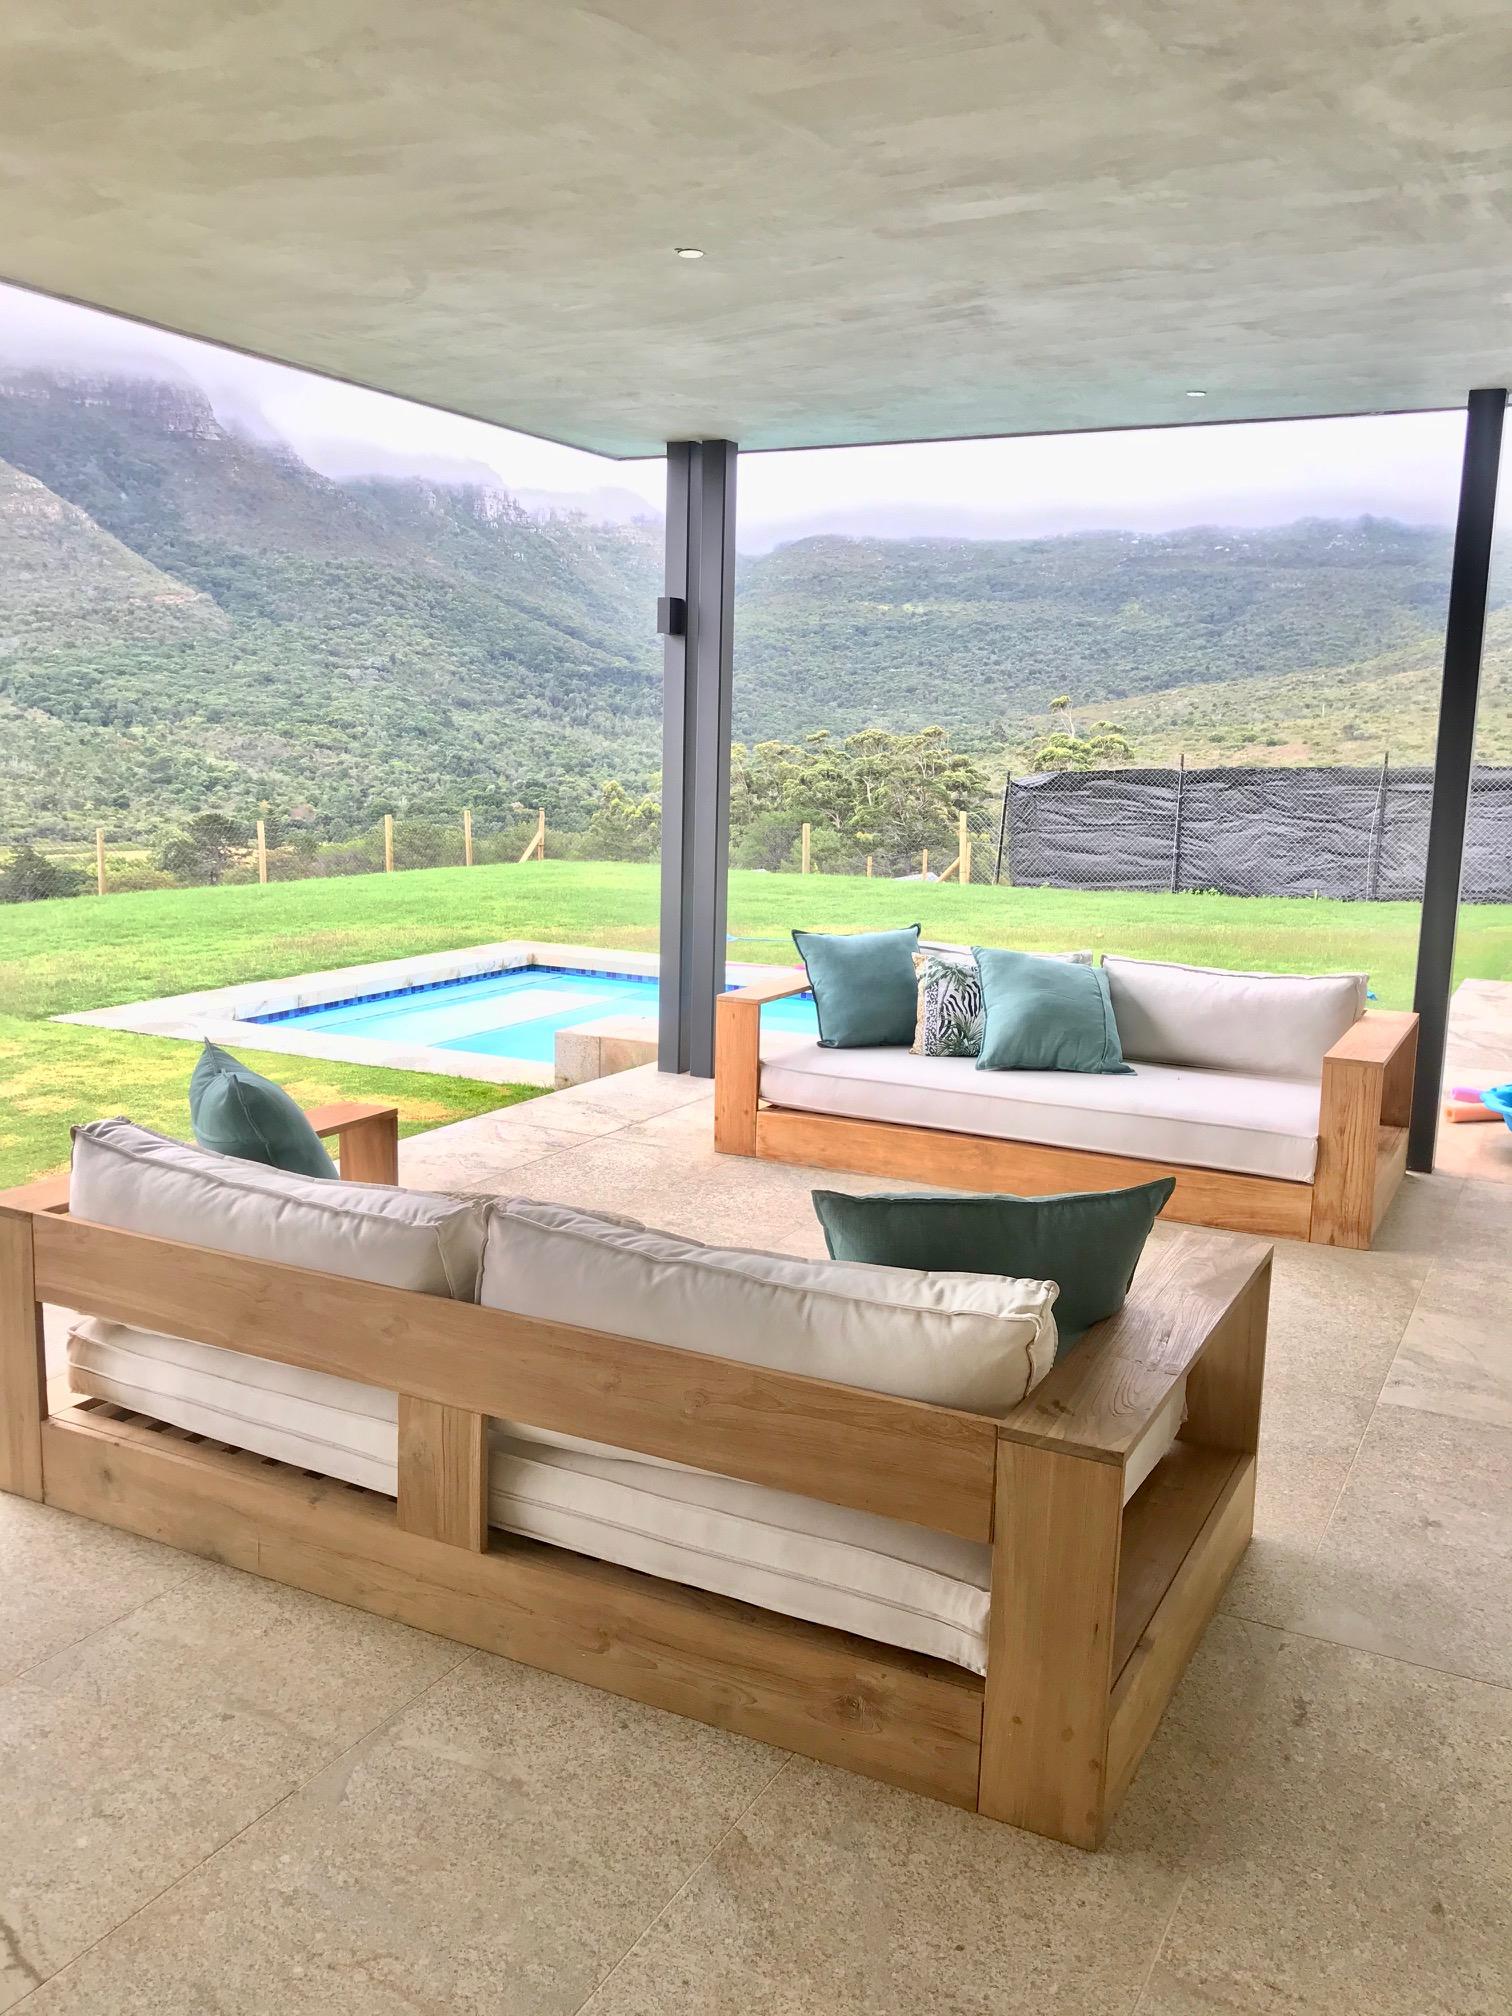 Outdoor couches in teak